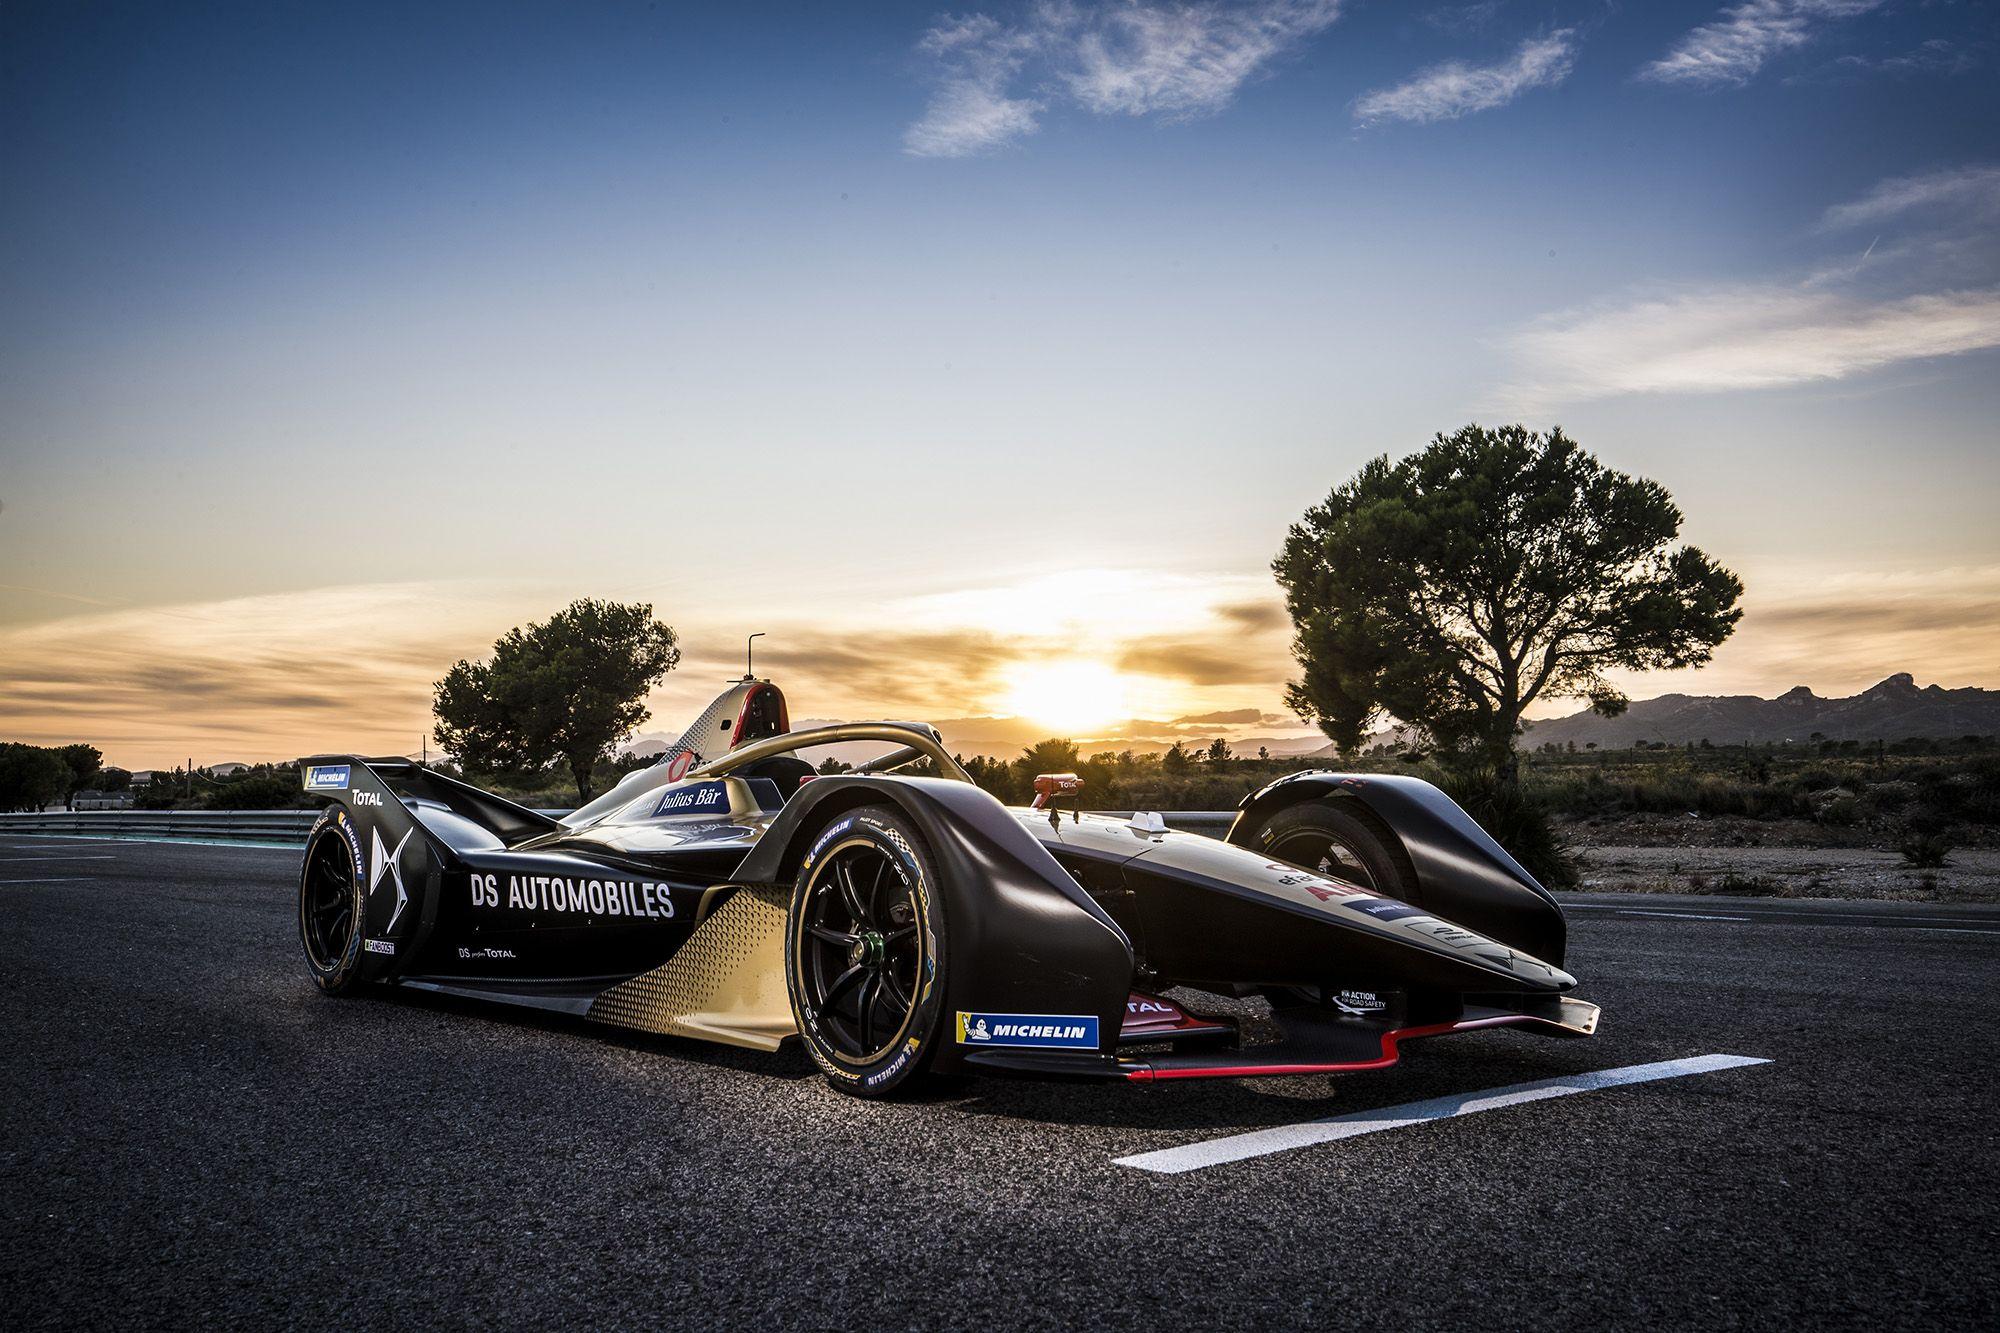 ds techeetah racing car